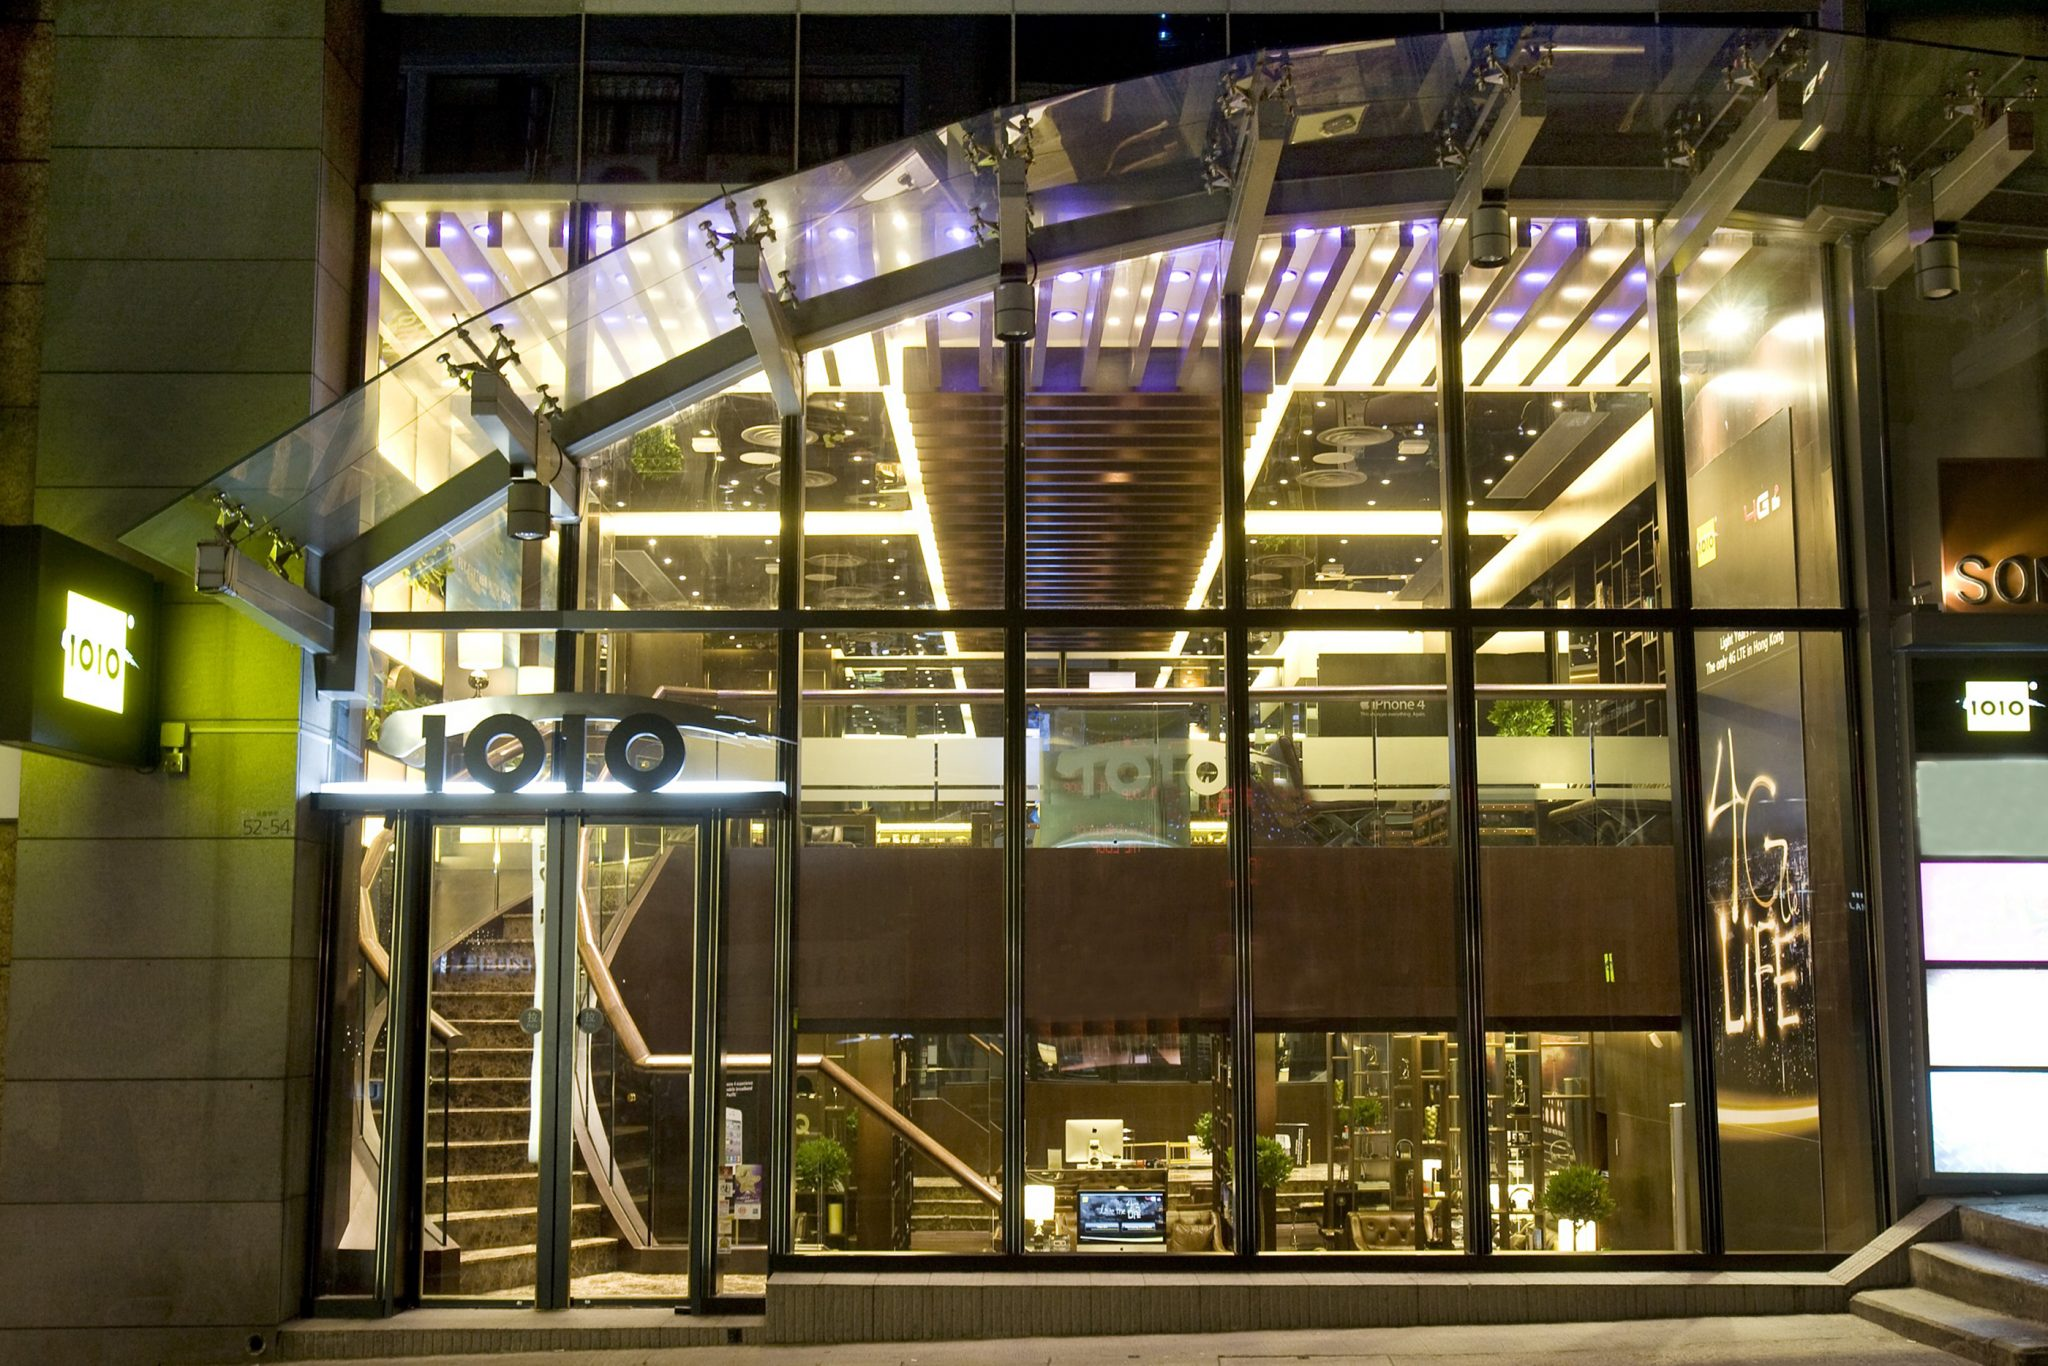 1O1O Flagship Store Central